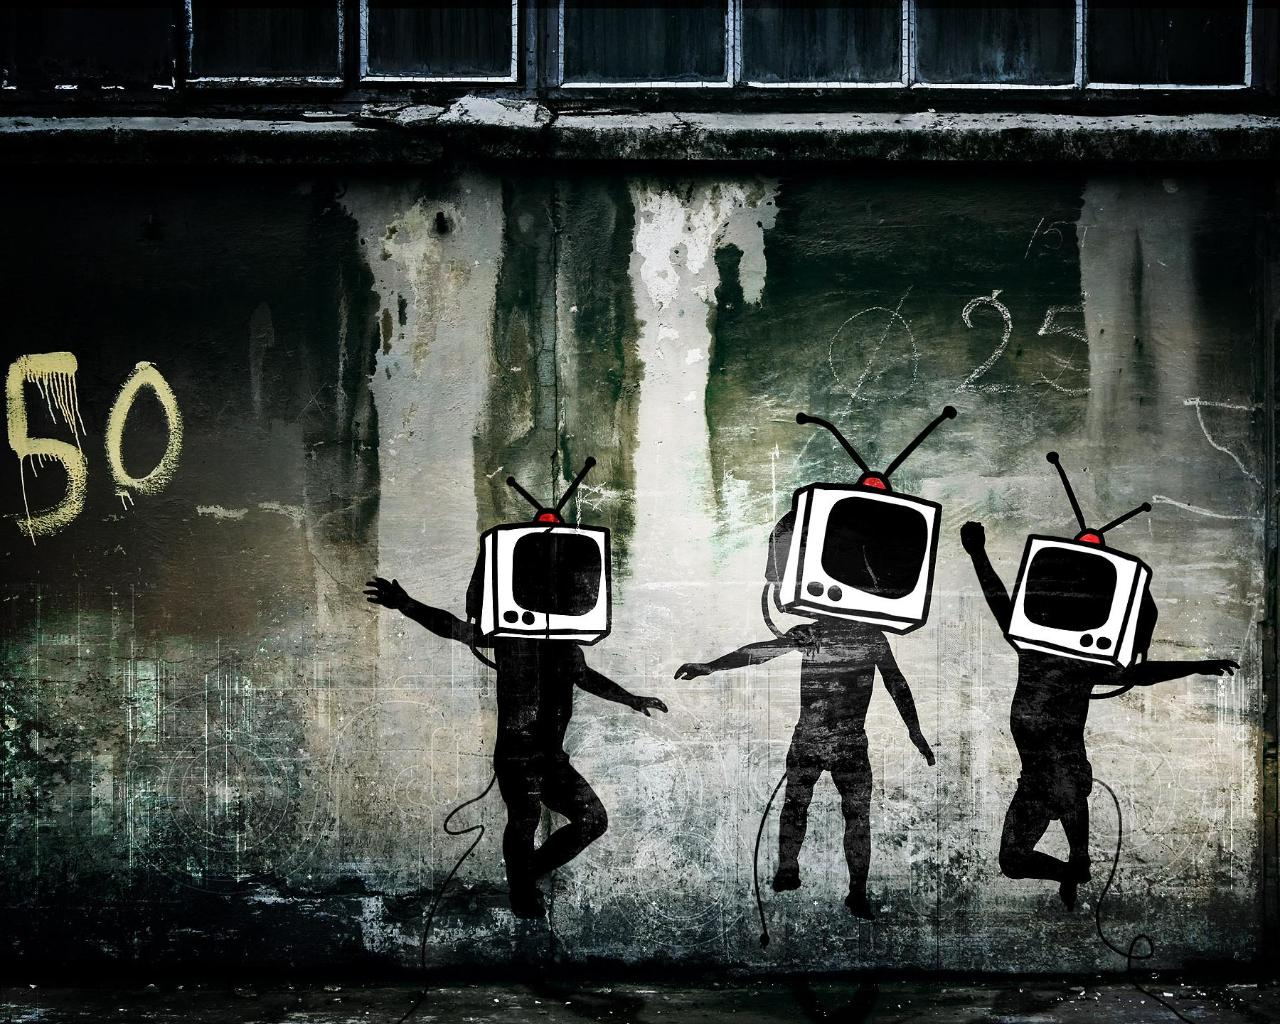 Love Wallpaper 60 Gambar Grafiti Dan Wallpaper Graffiti Terkeren